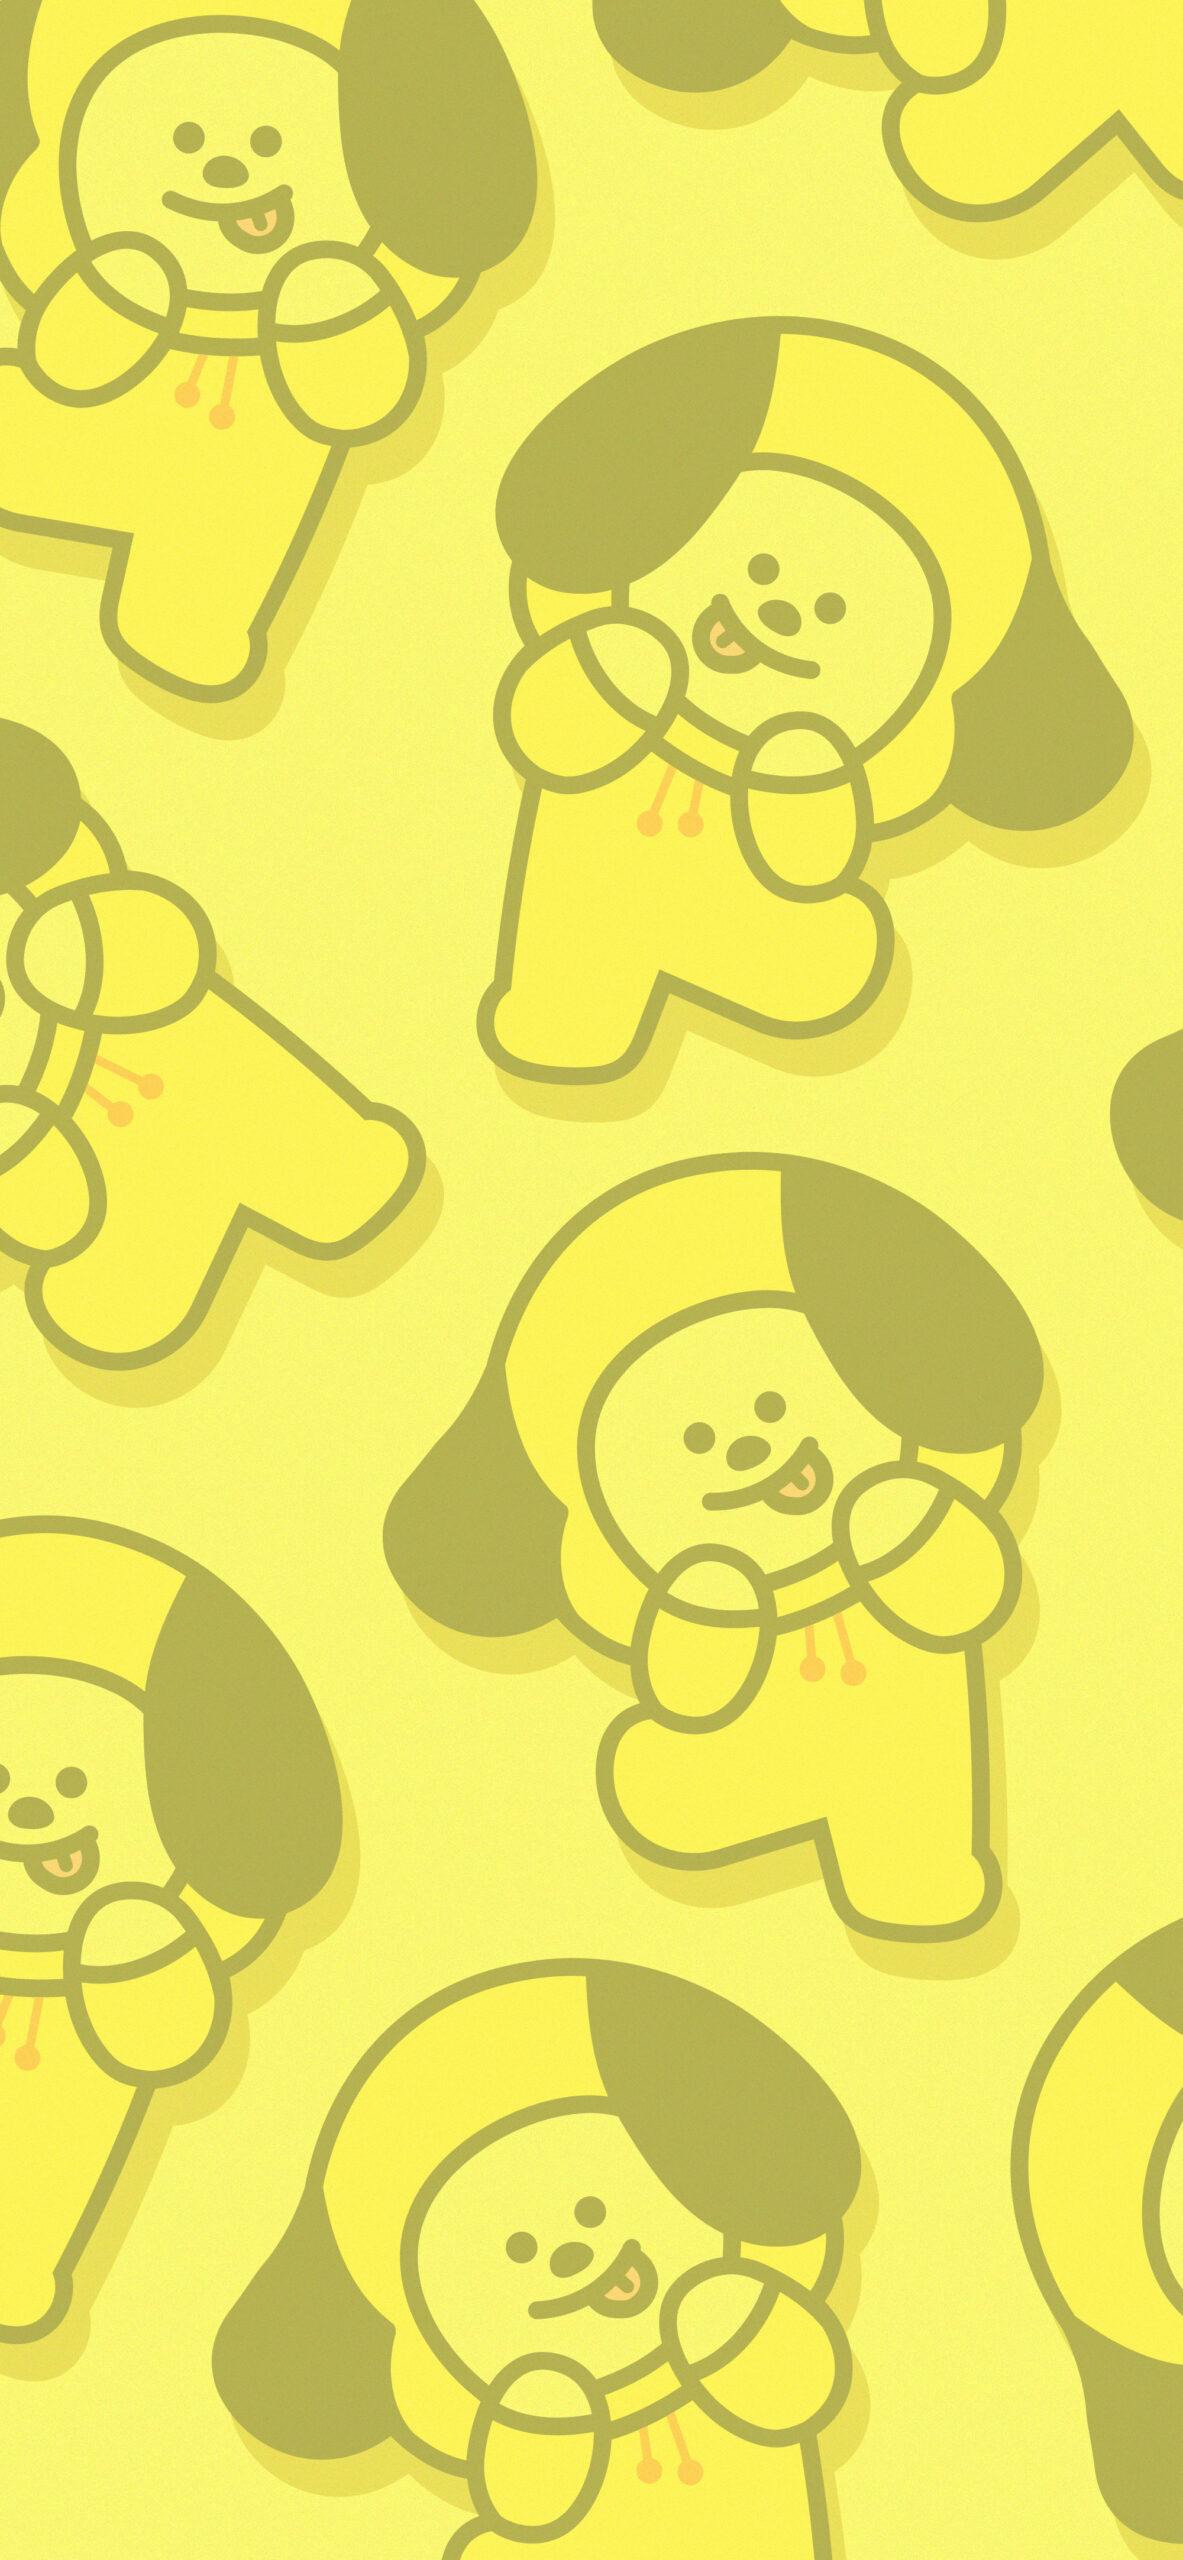 bts bt21 chimmy yellow background 2